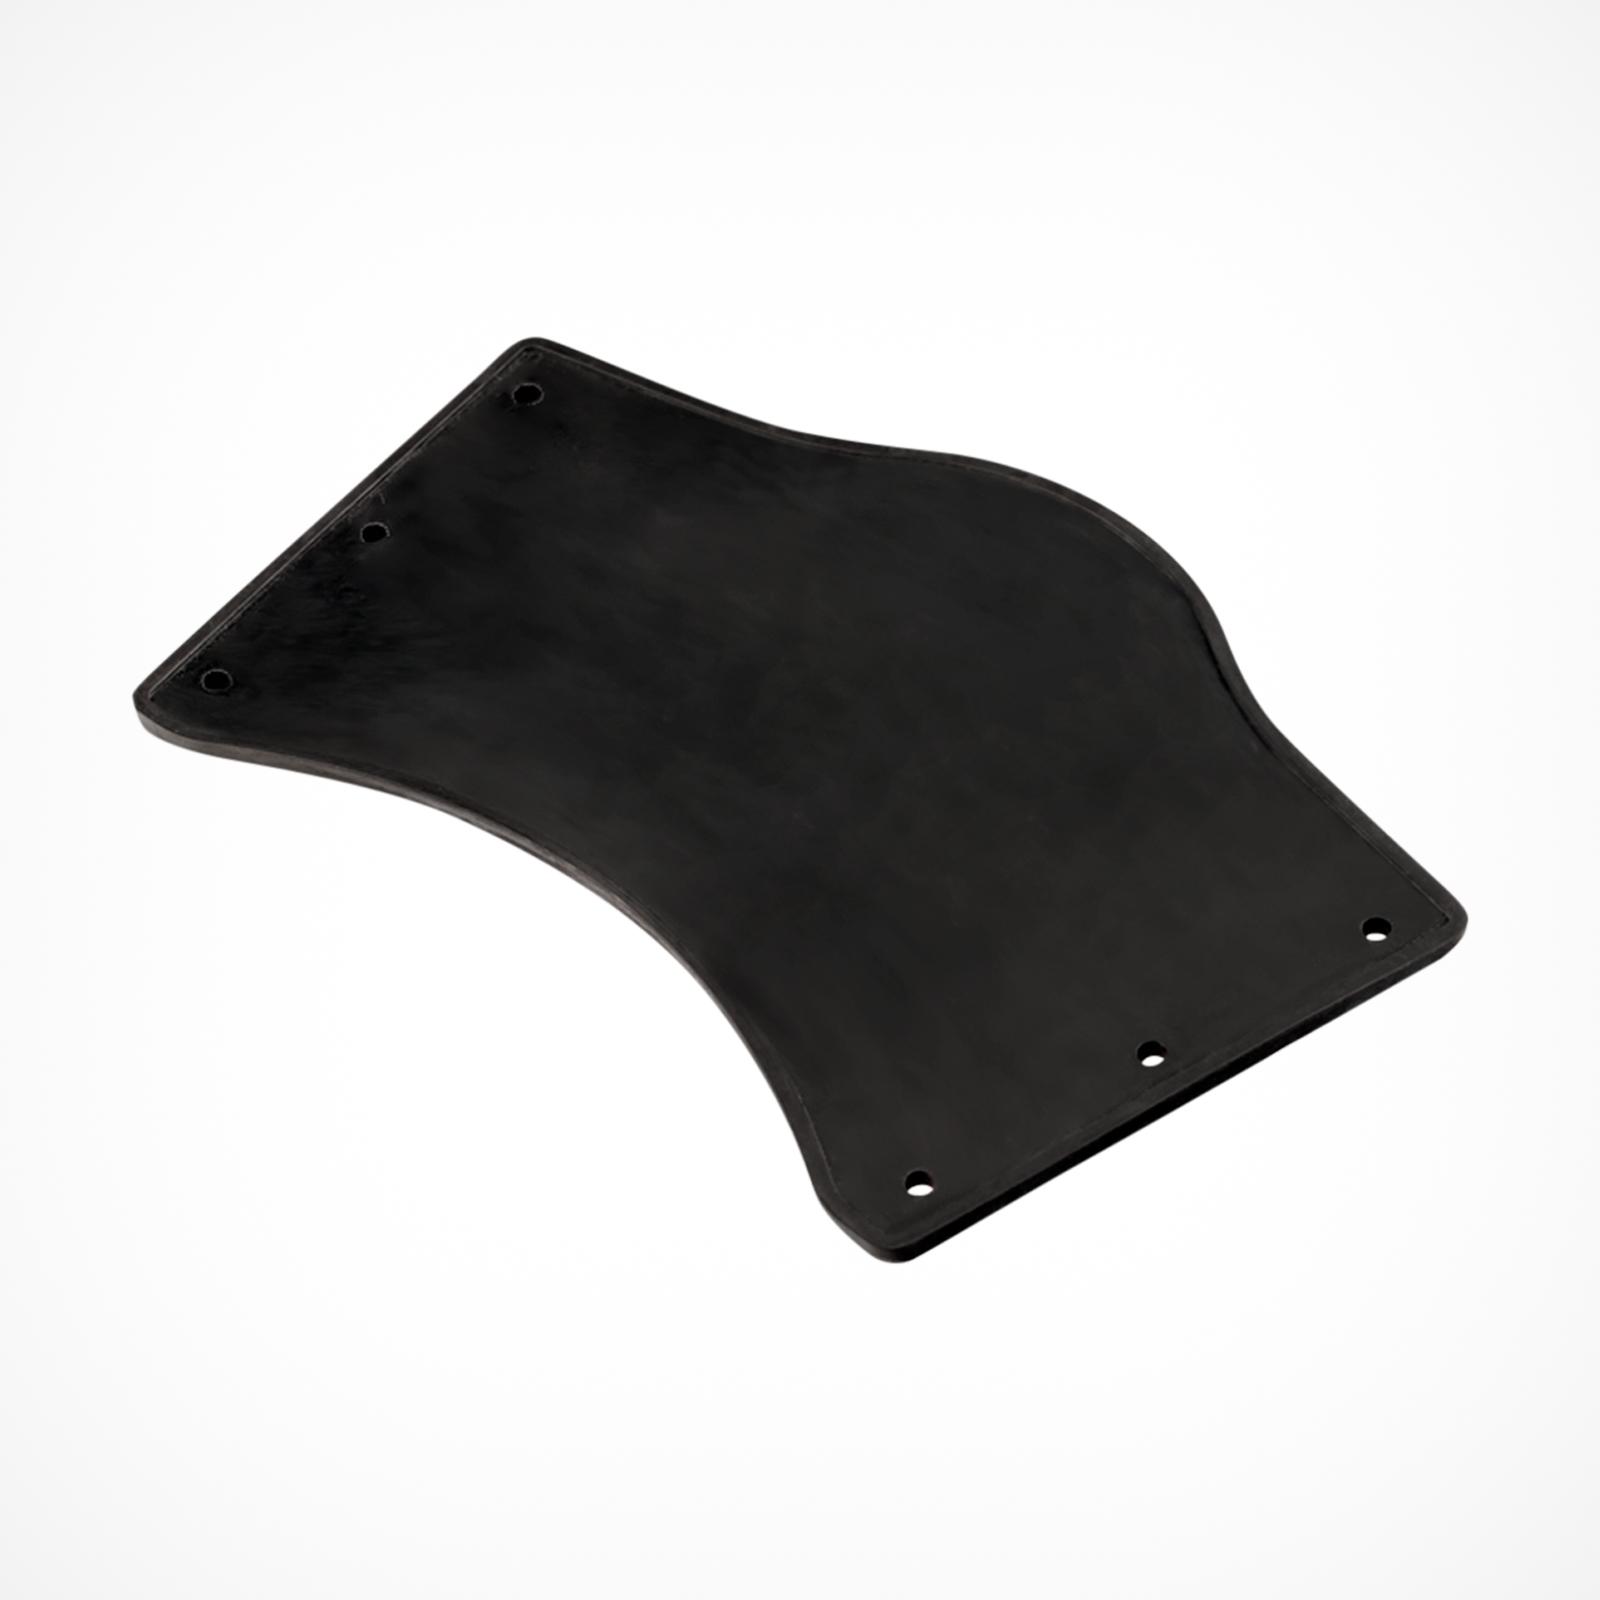 MESLE Rubber for B22R Rear Toe Strap